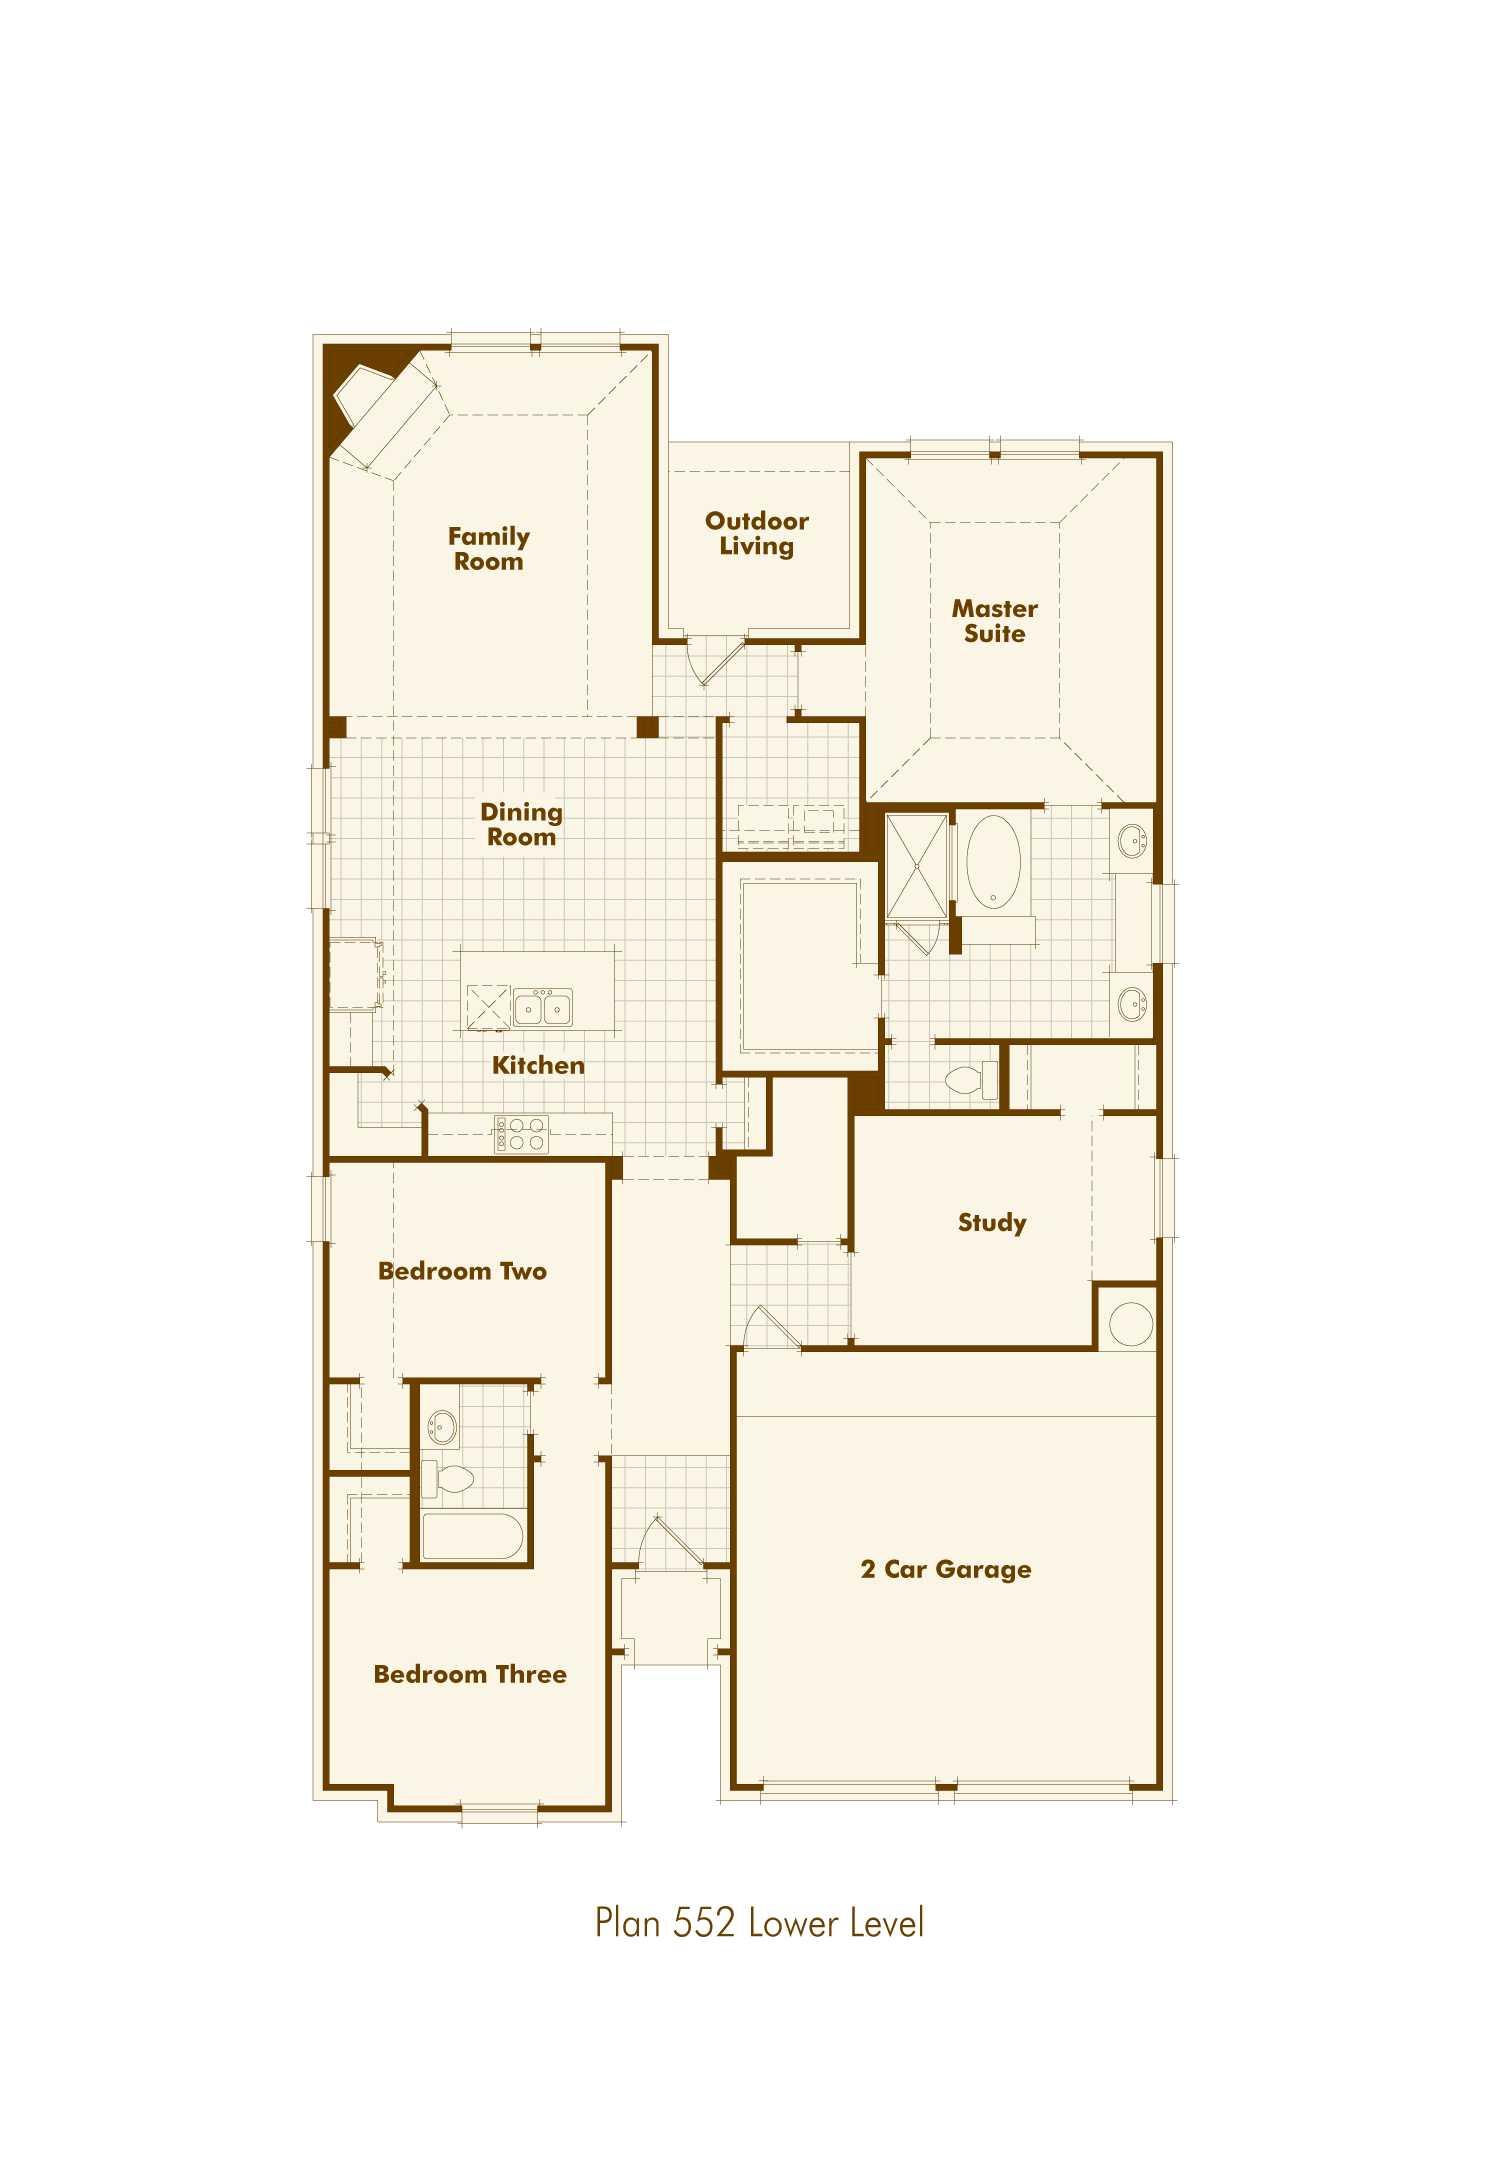 Woods Of Britton Floor Plans